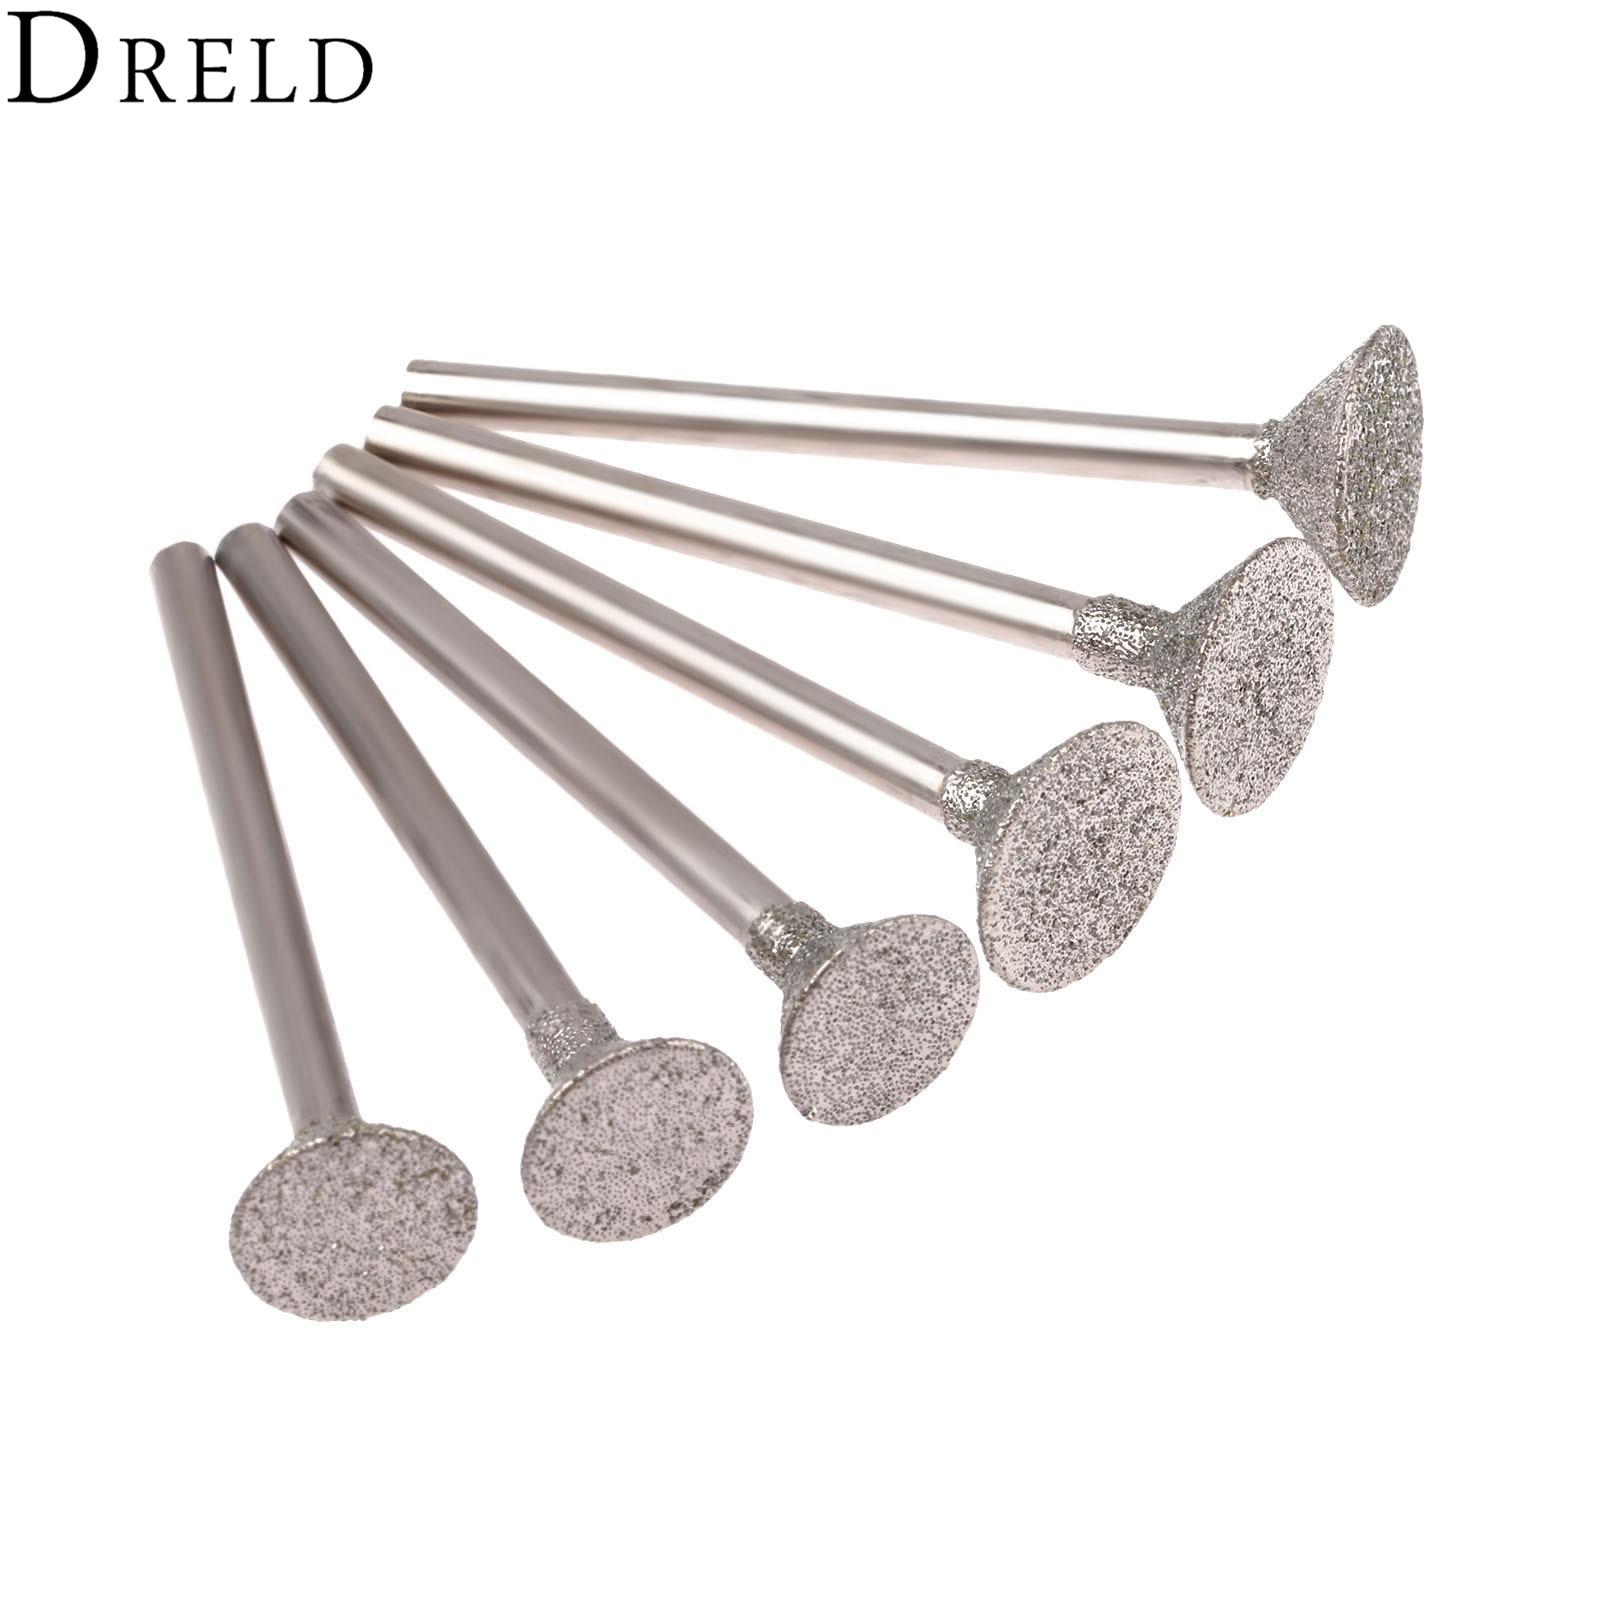 7pcs Diamond Grinding Head Jade Spherical Concave Burrs for Dremel Rotary Tool